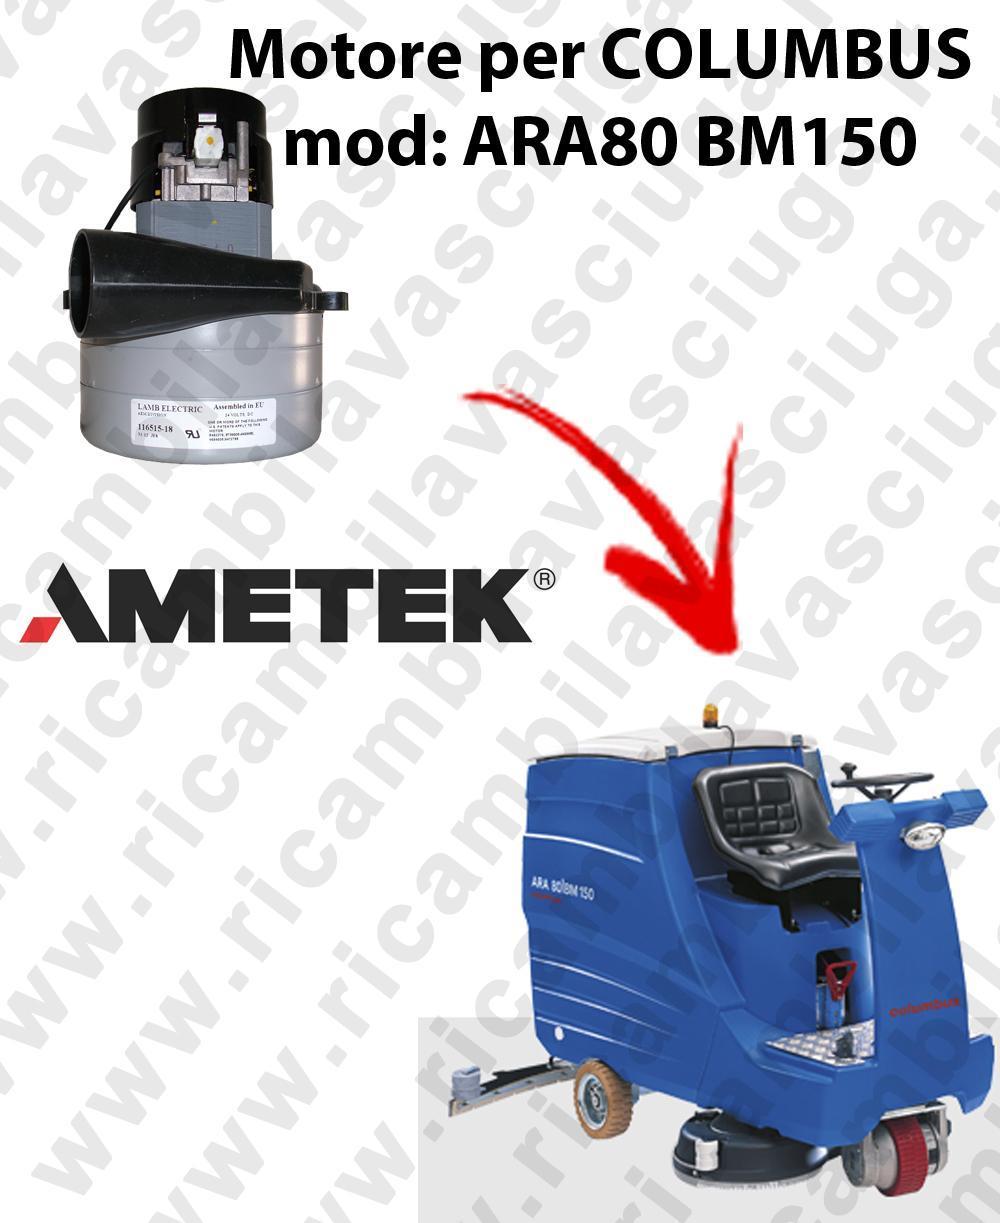 ARA80 BM150 Saugmotor LAMB AMETEK für scheuersaugmaschinen COLUMBUS